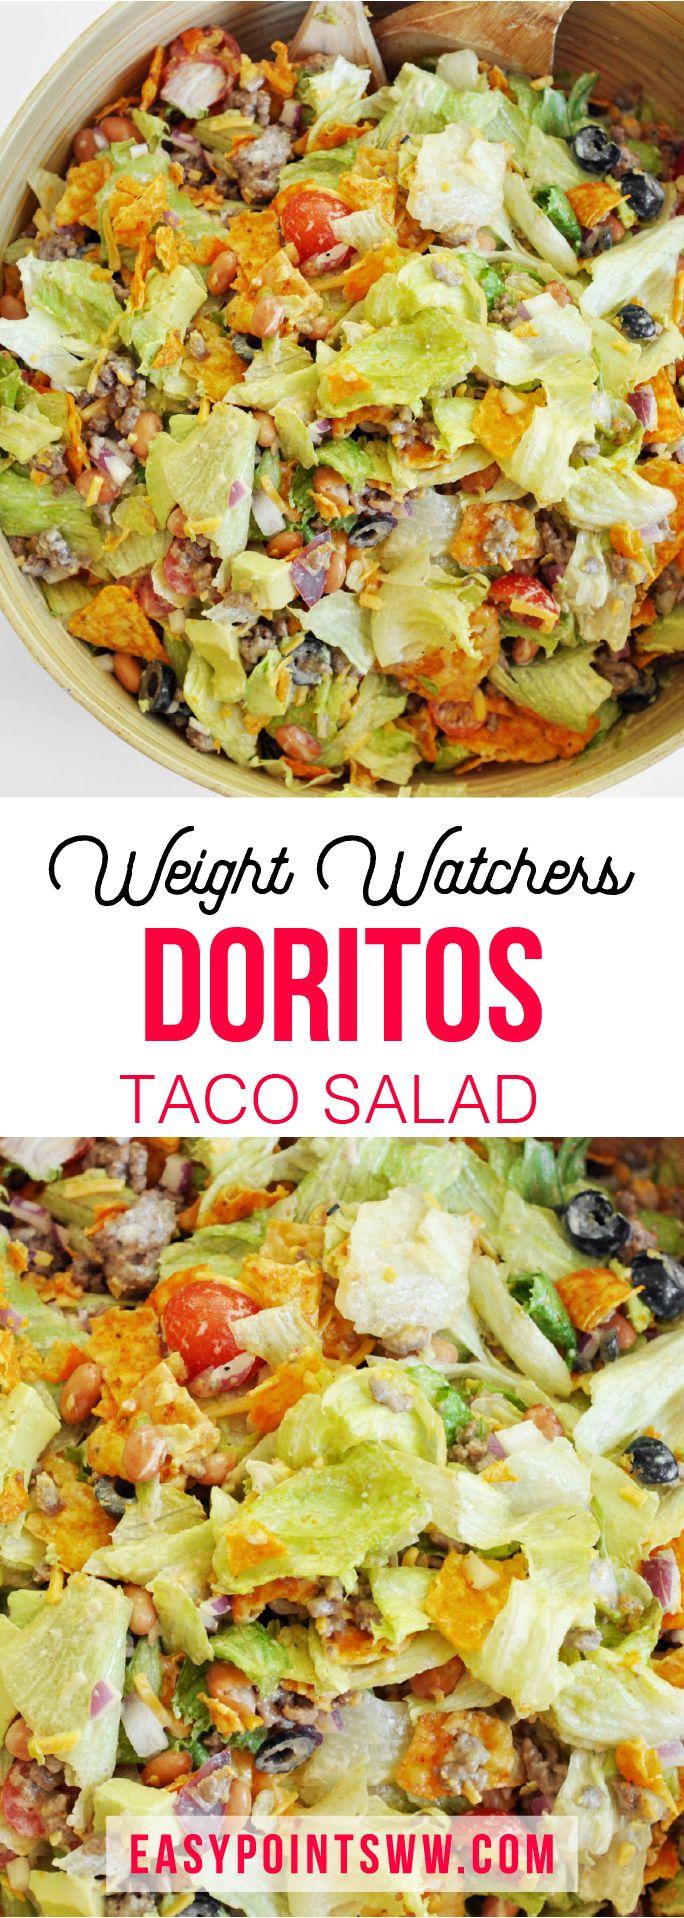 WW Doritos Taco Salad ♥